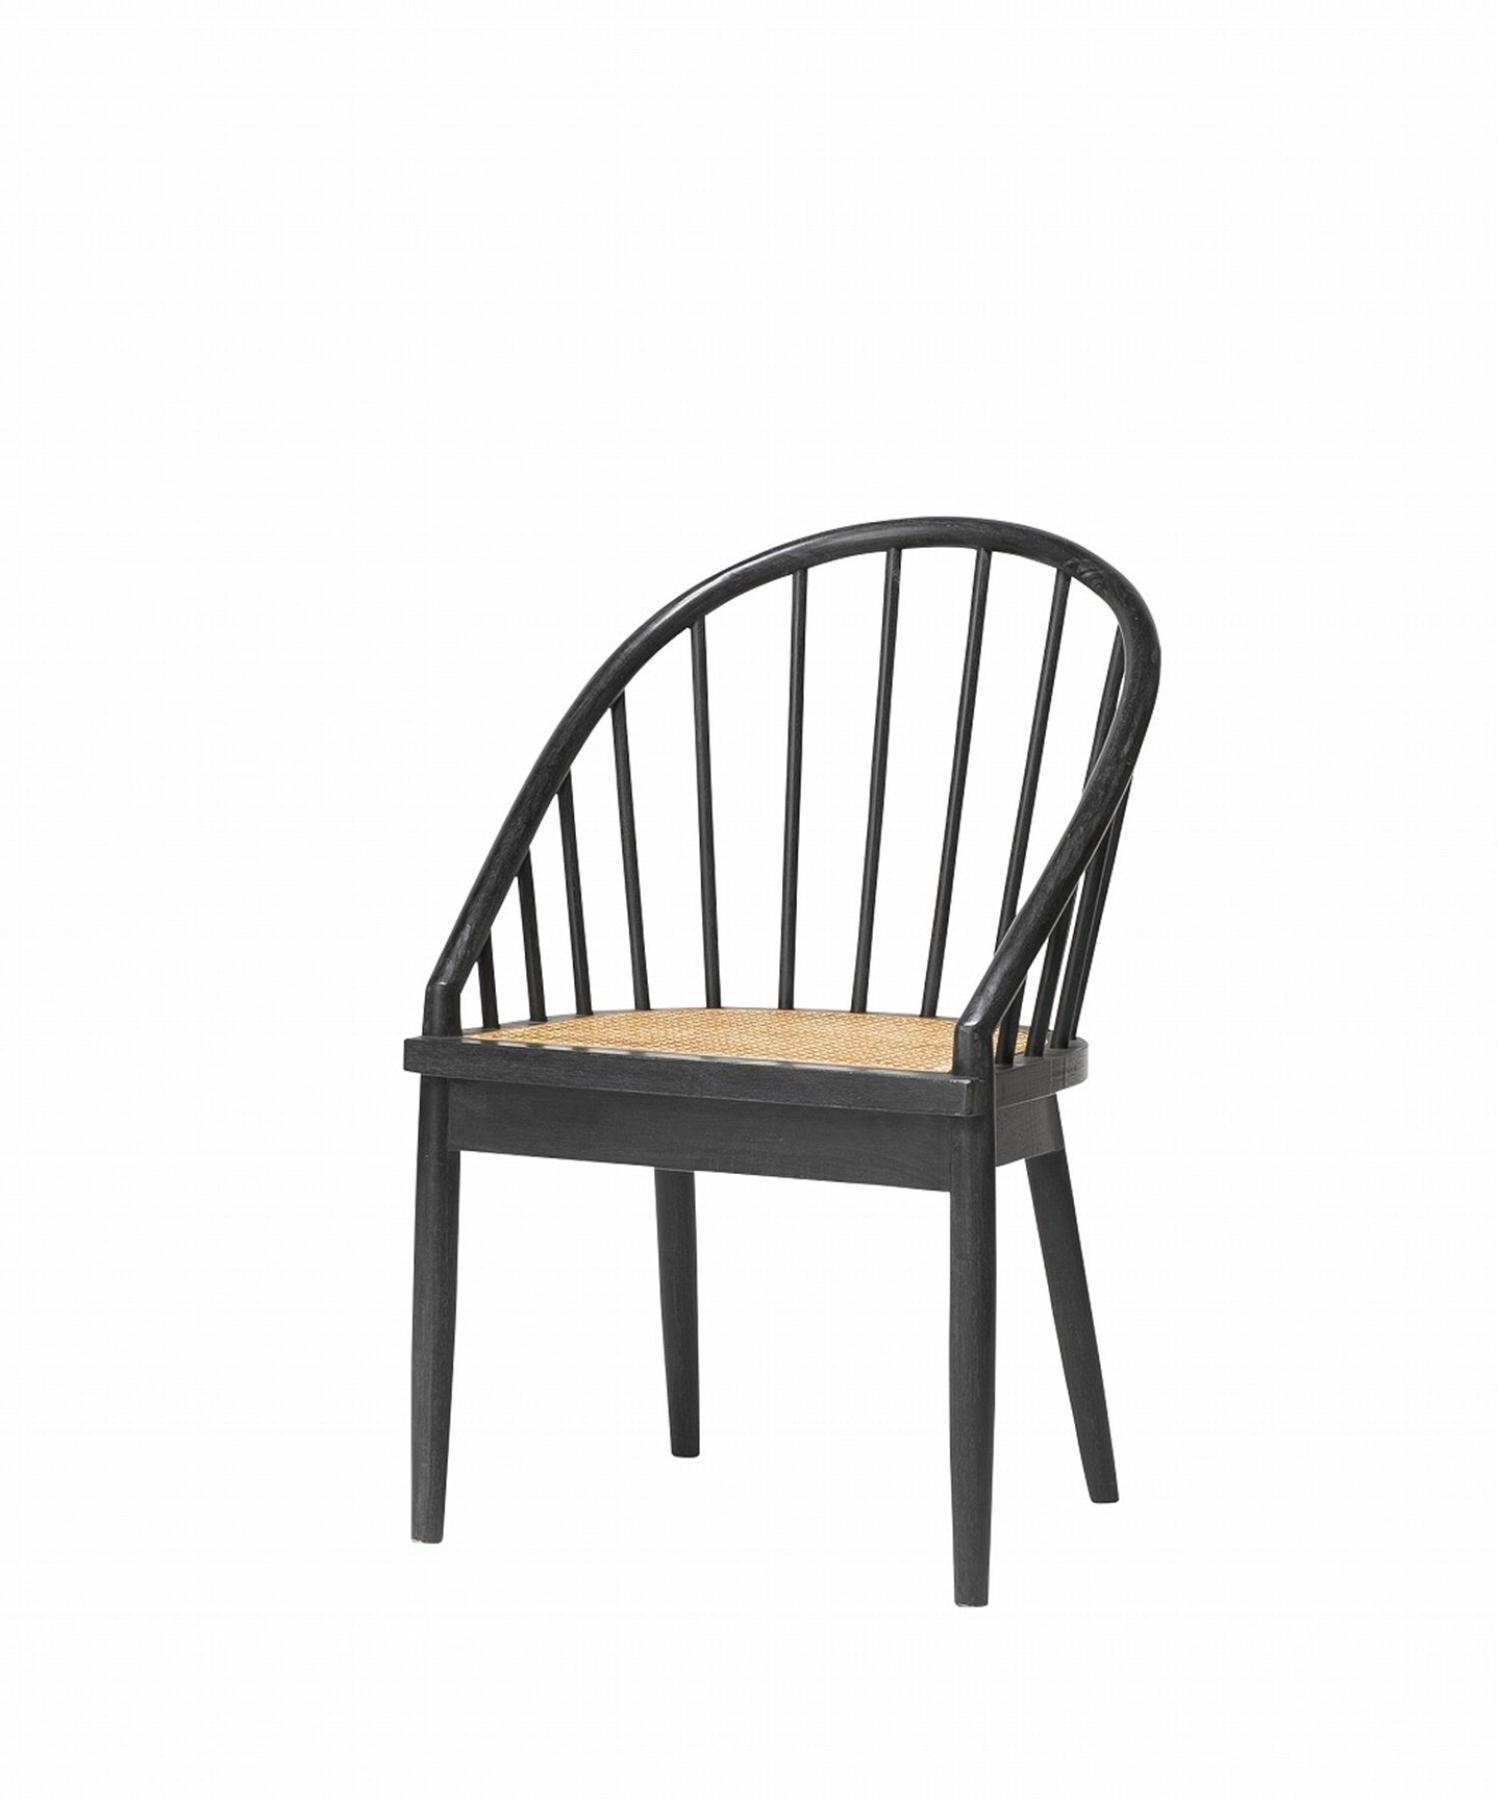 journal standard Furniture ジャーナルスタンダードファニチャー 家具 GIORGI CHAIR BK ジョルジチェア ブラック